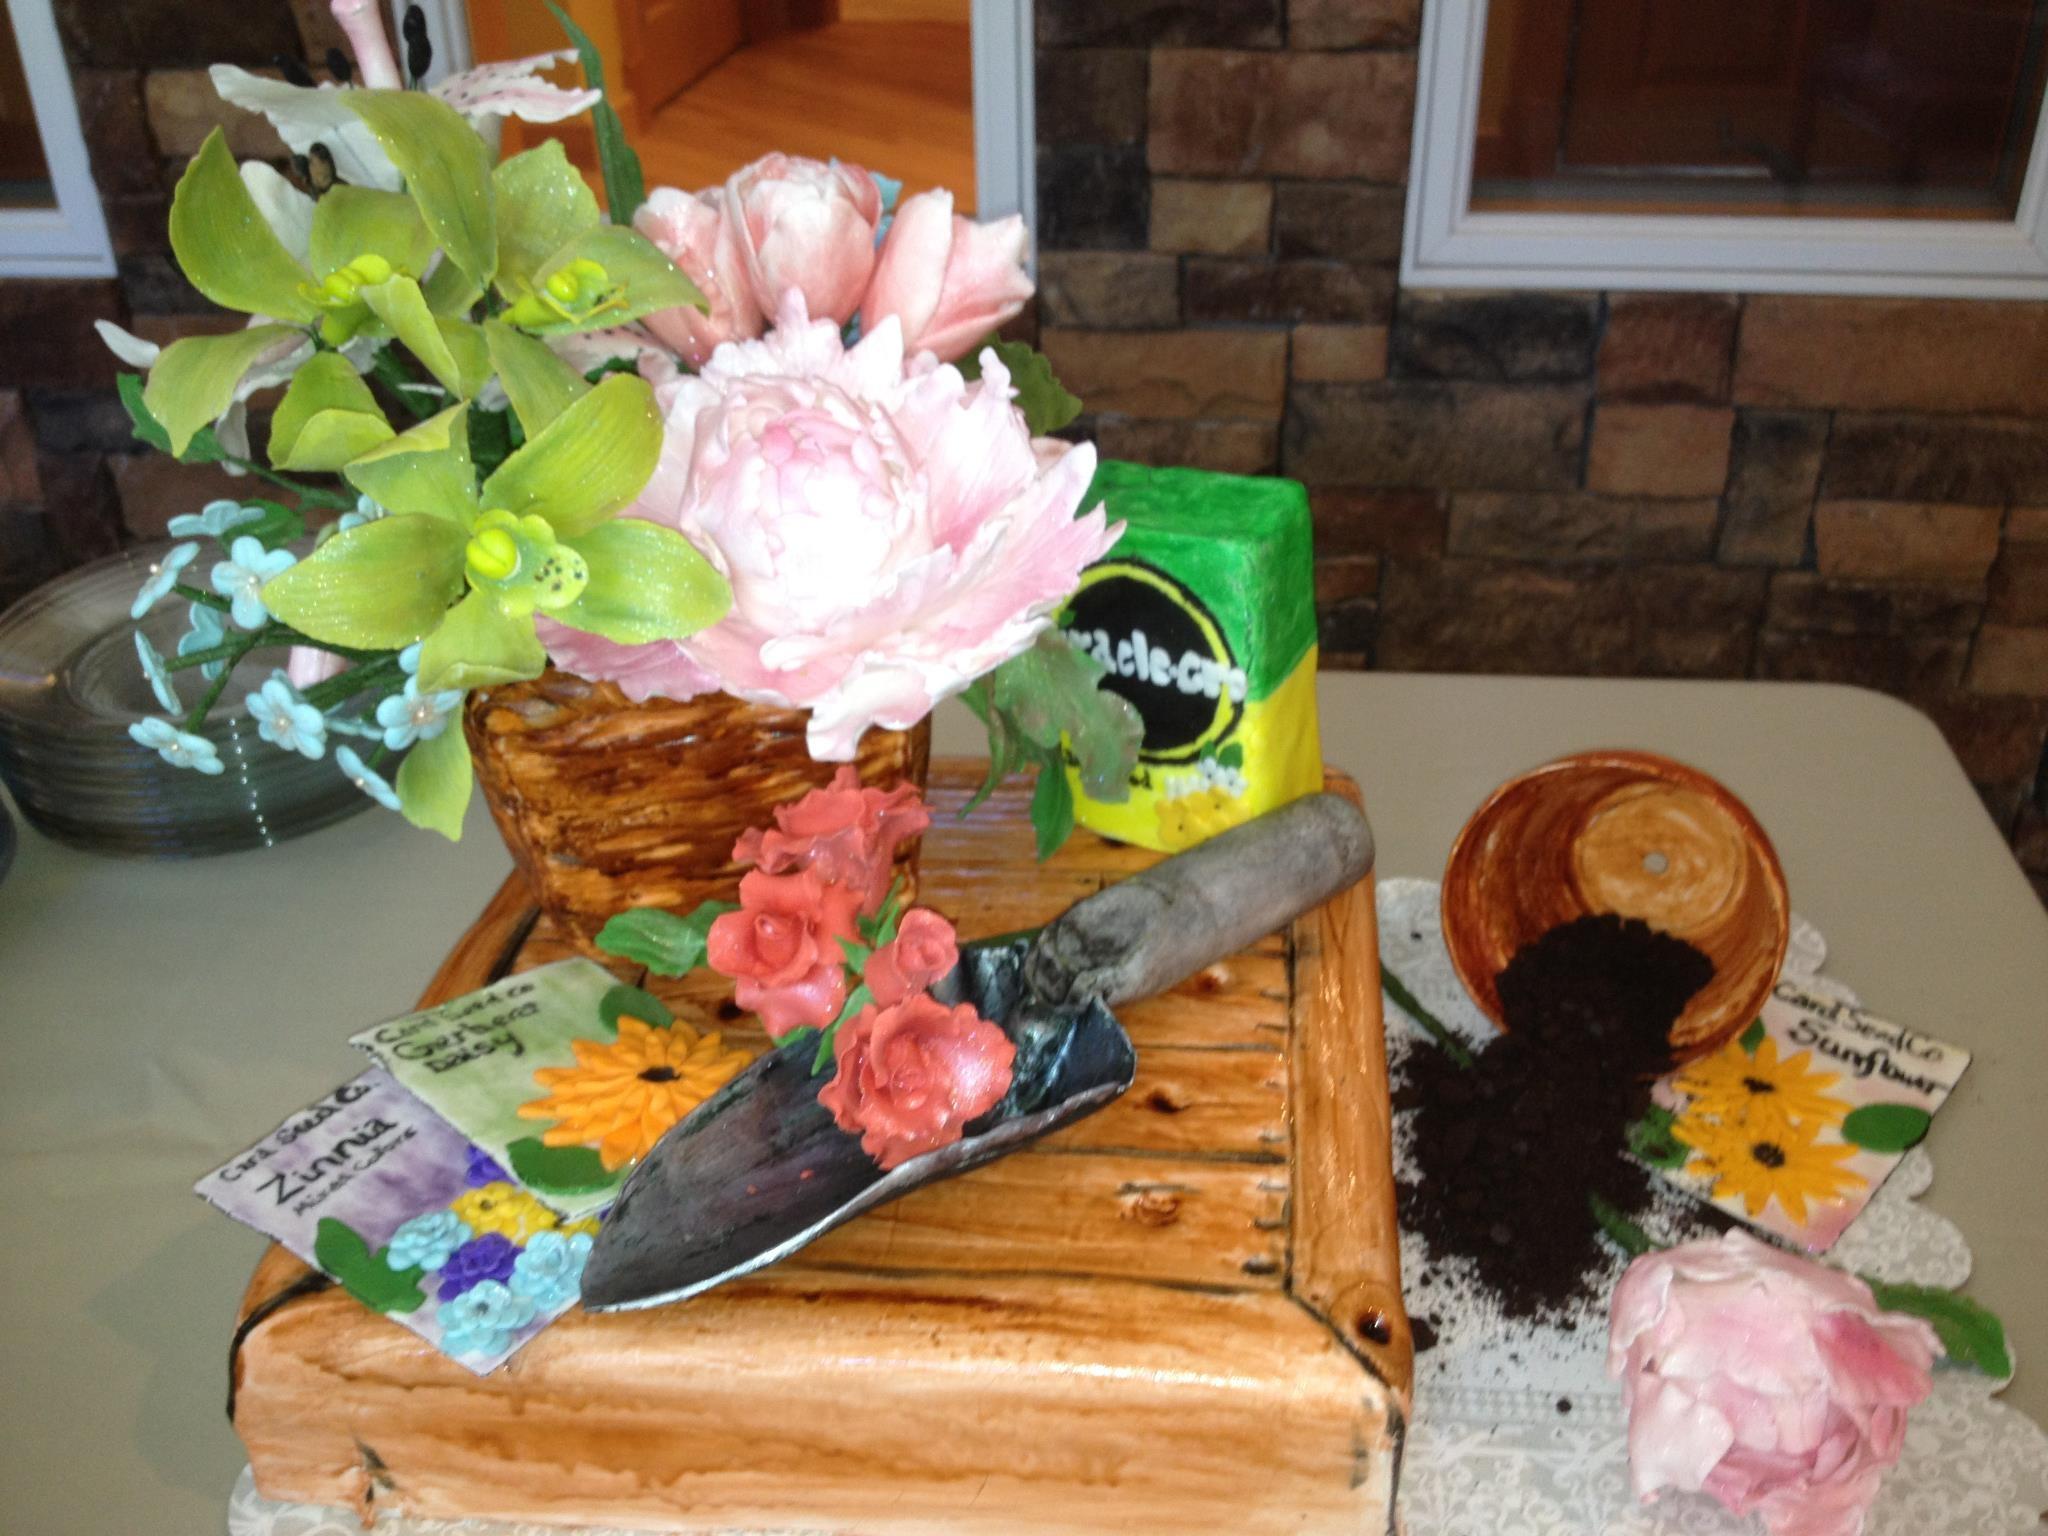 Gum paste flowers for garden club.